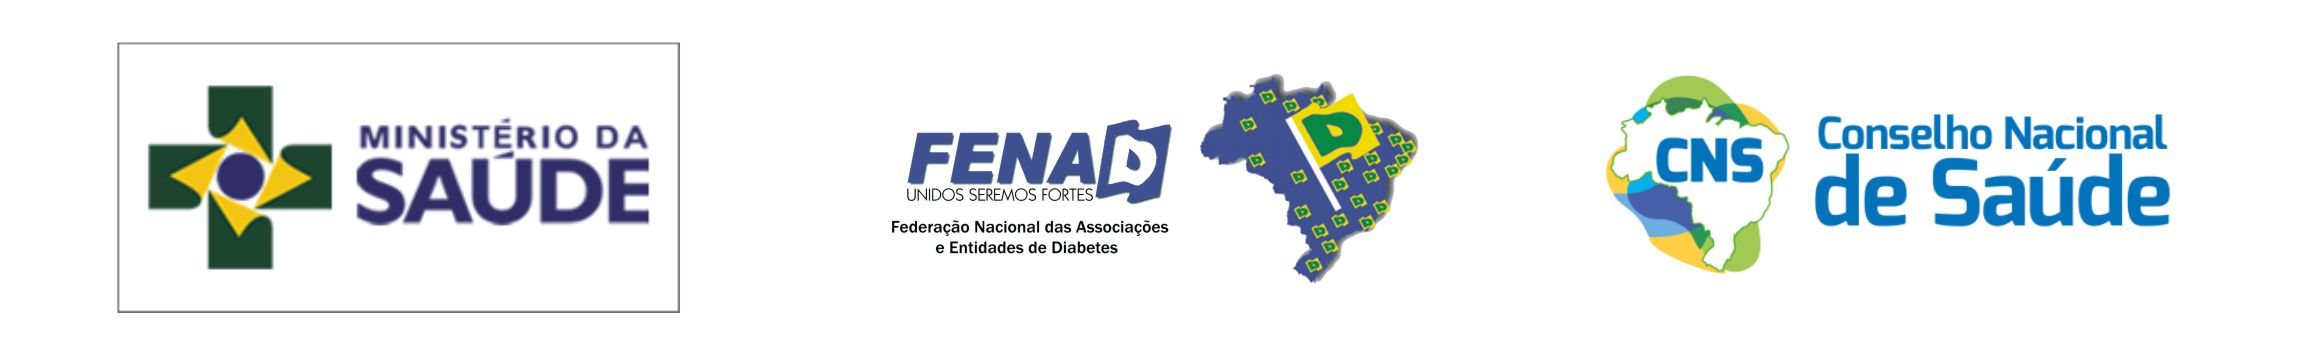 MS-FENAD-CNS